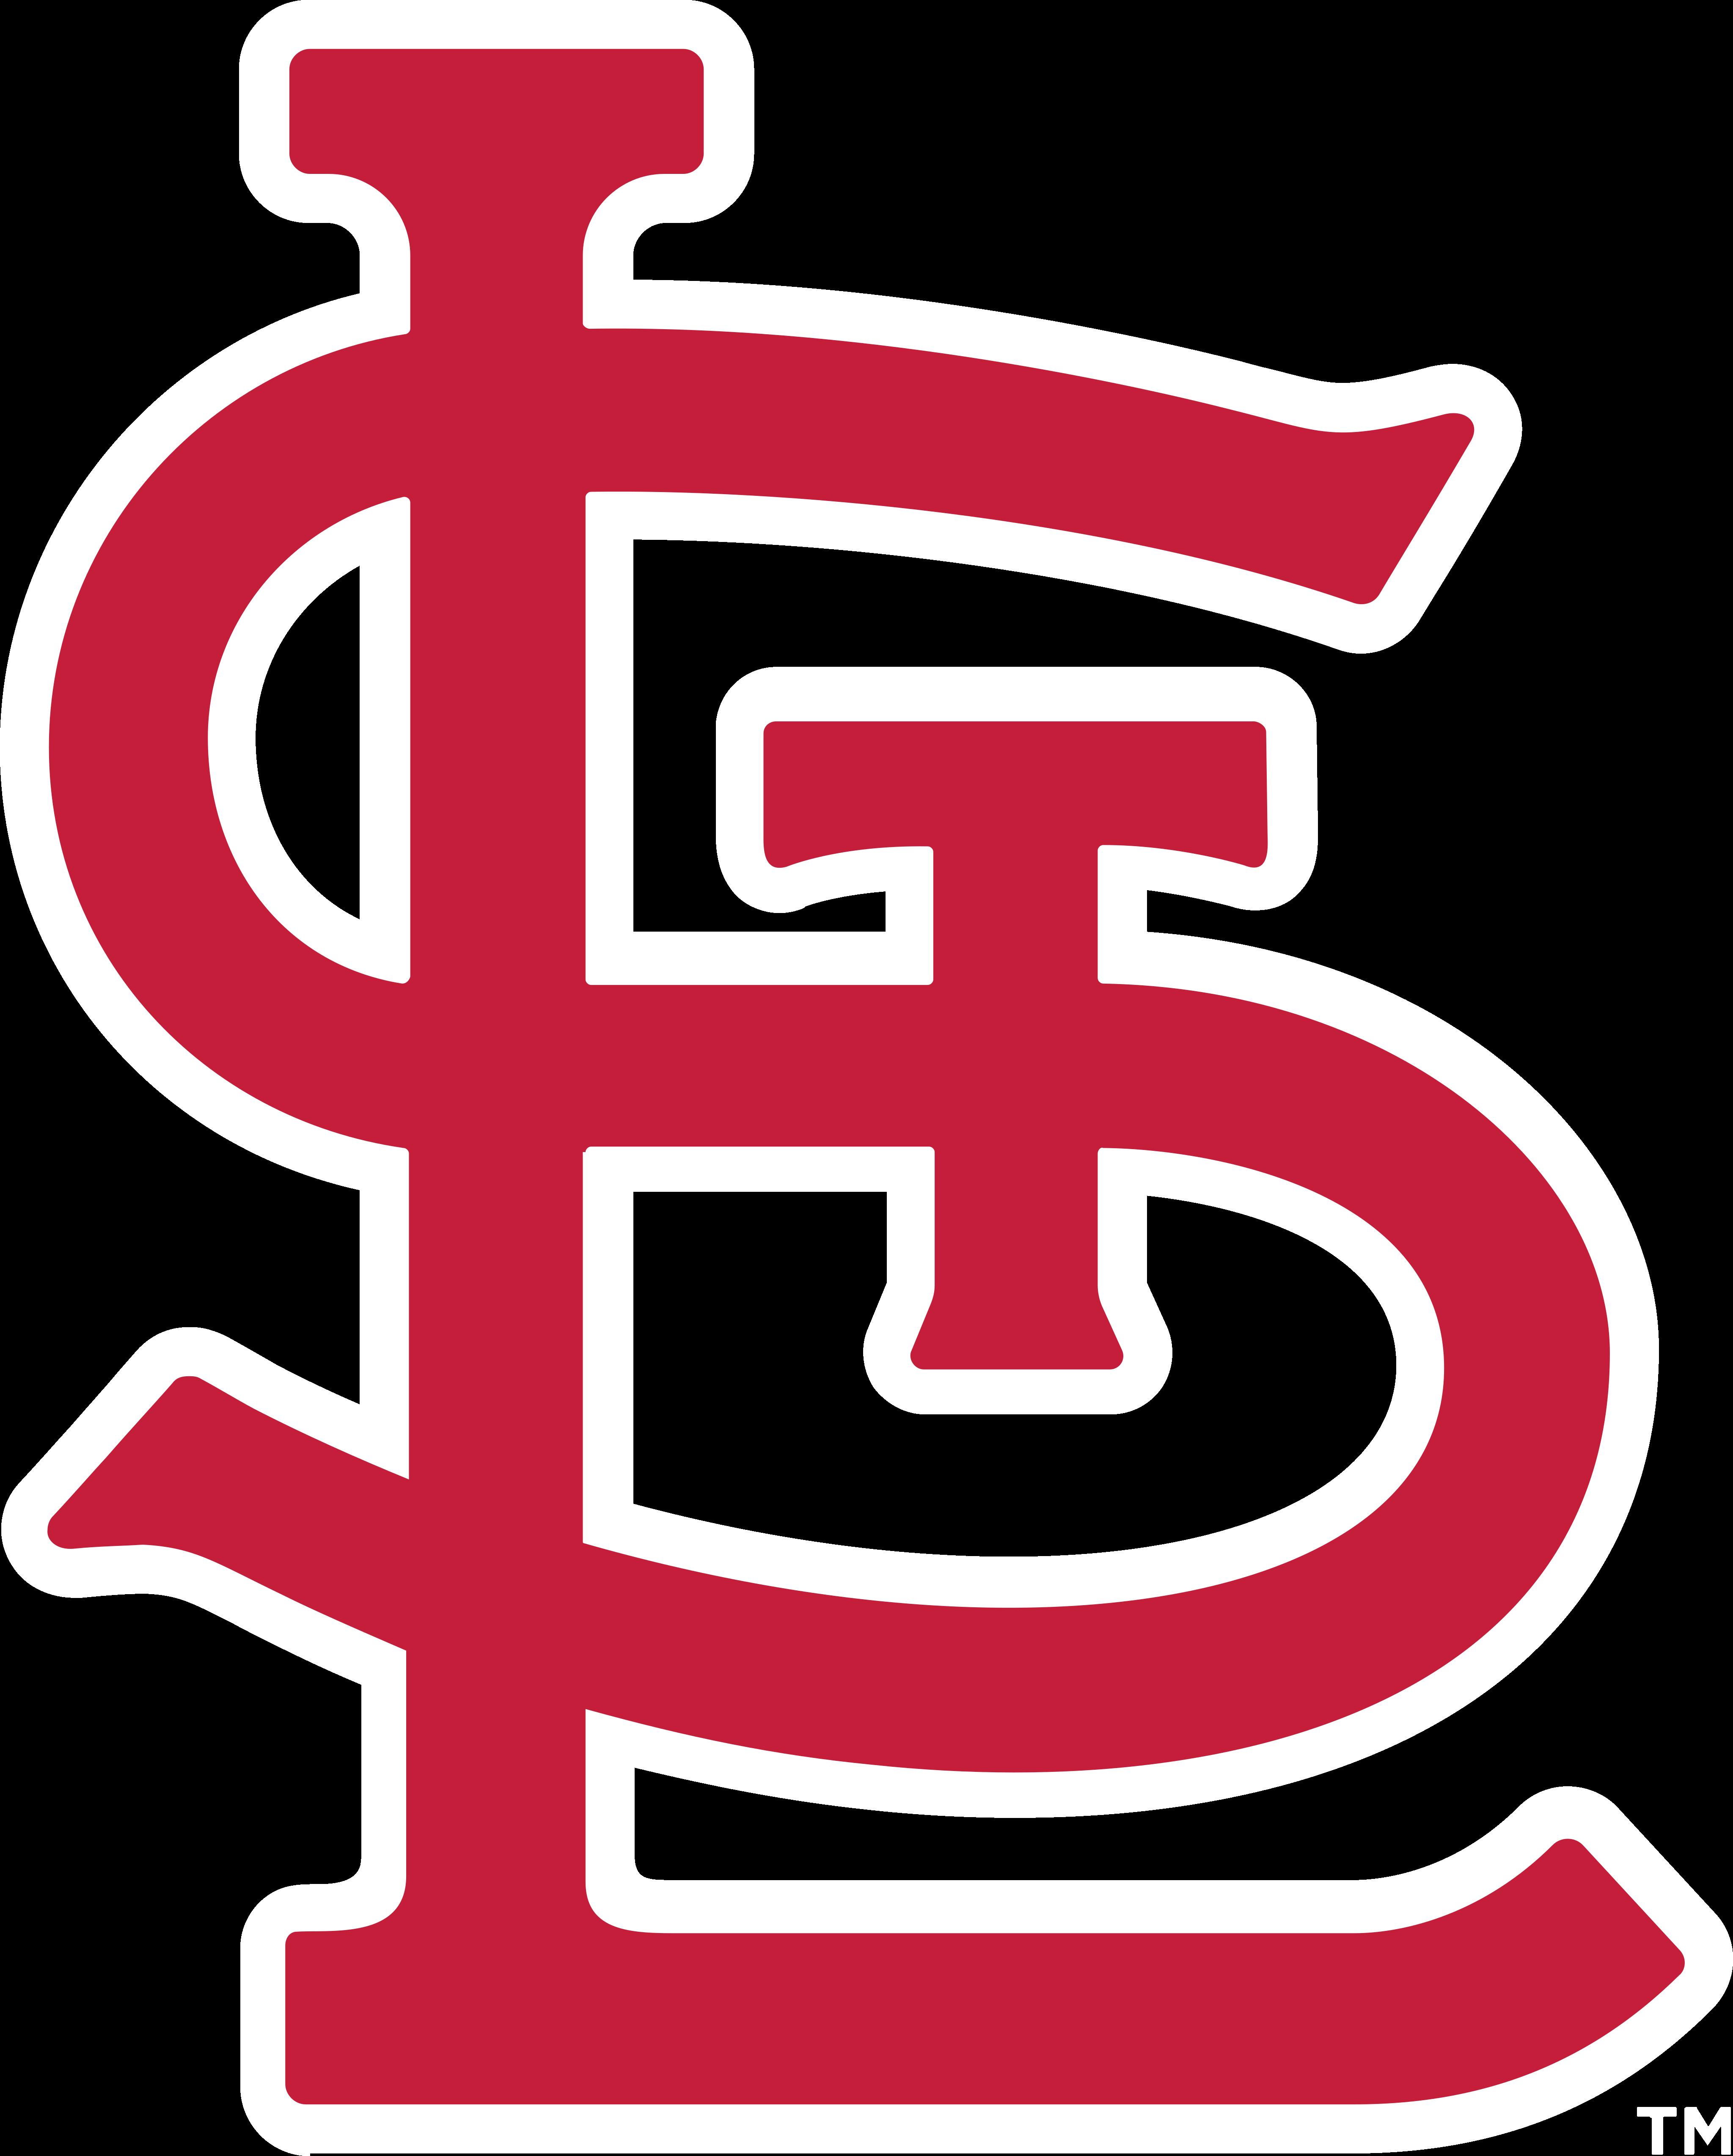 St. Louis Cardinals.